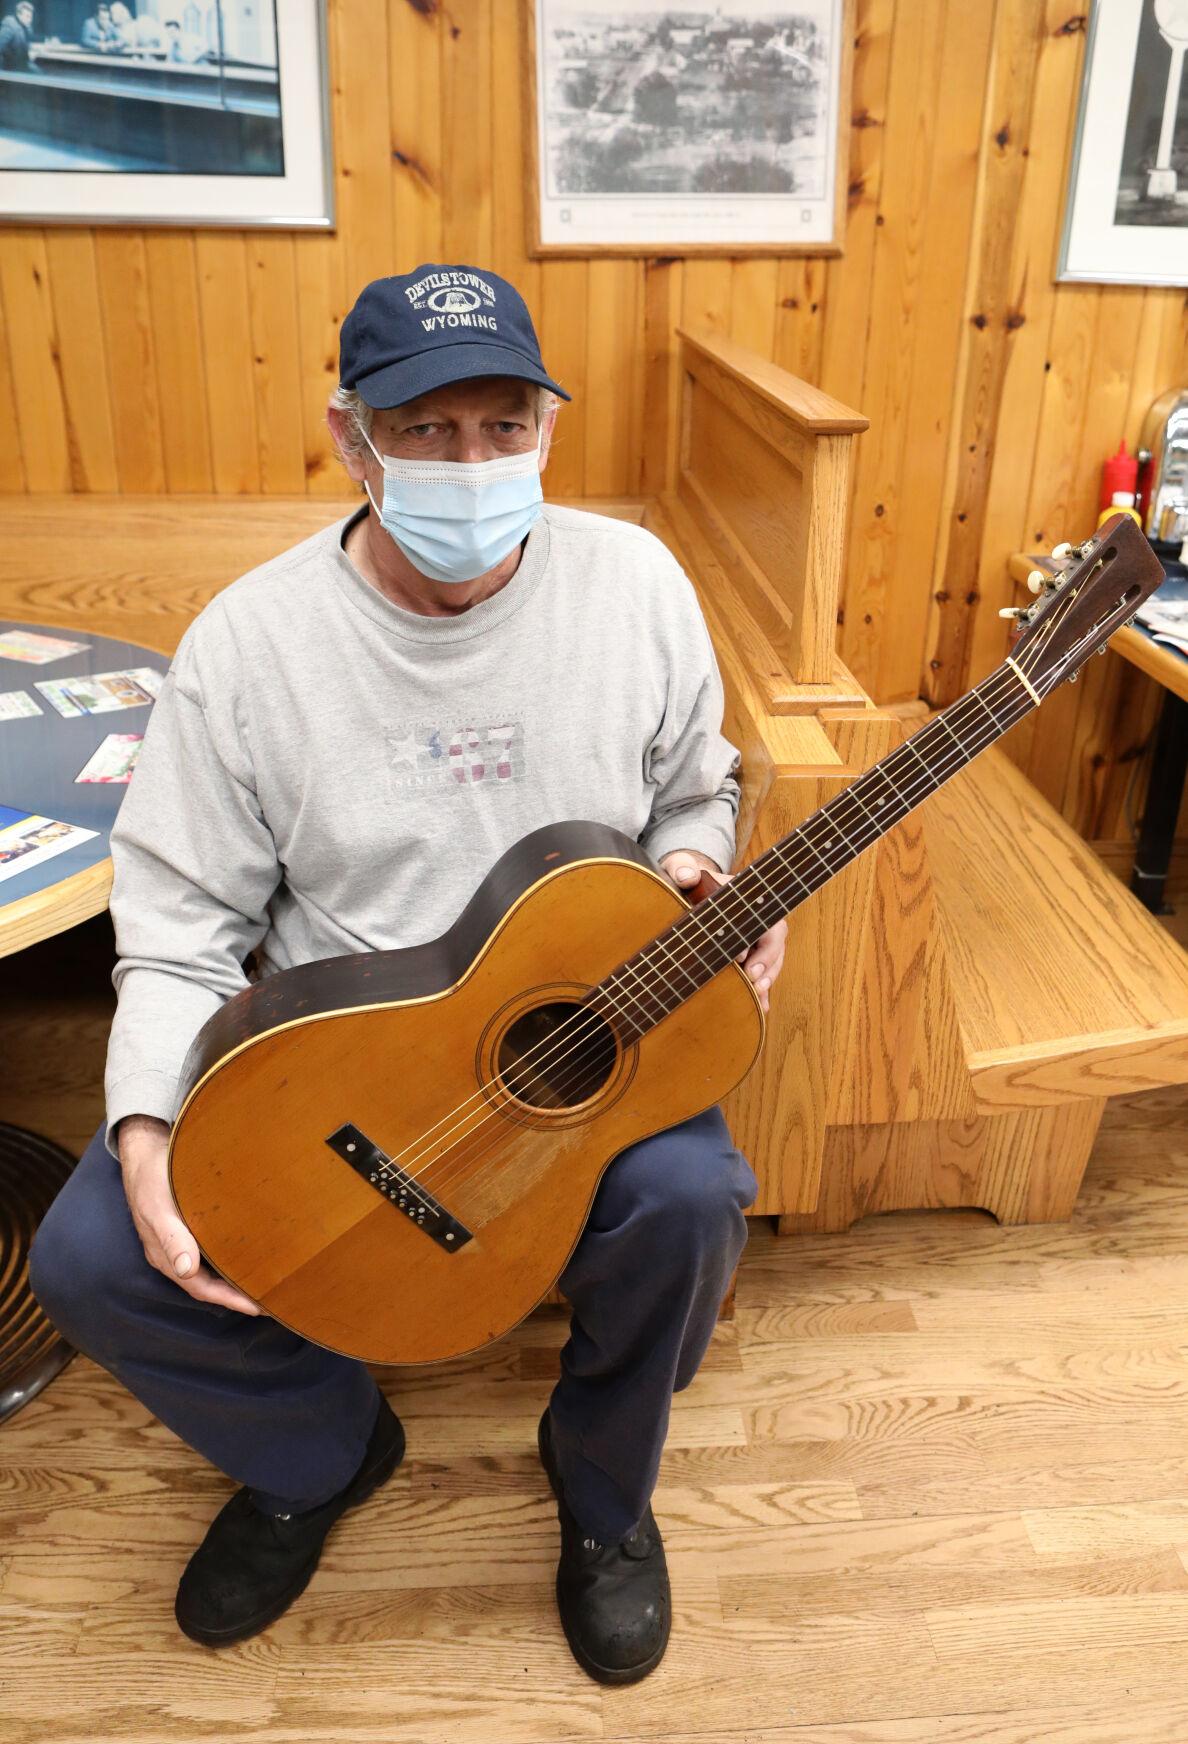 Matt Snodgrass poses with his guitar